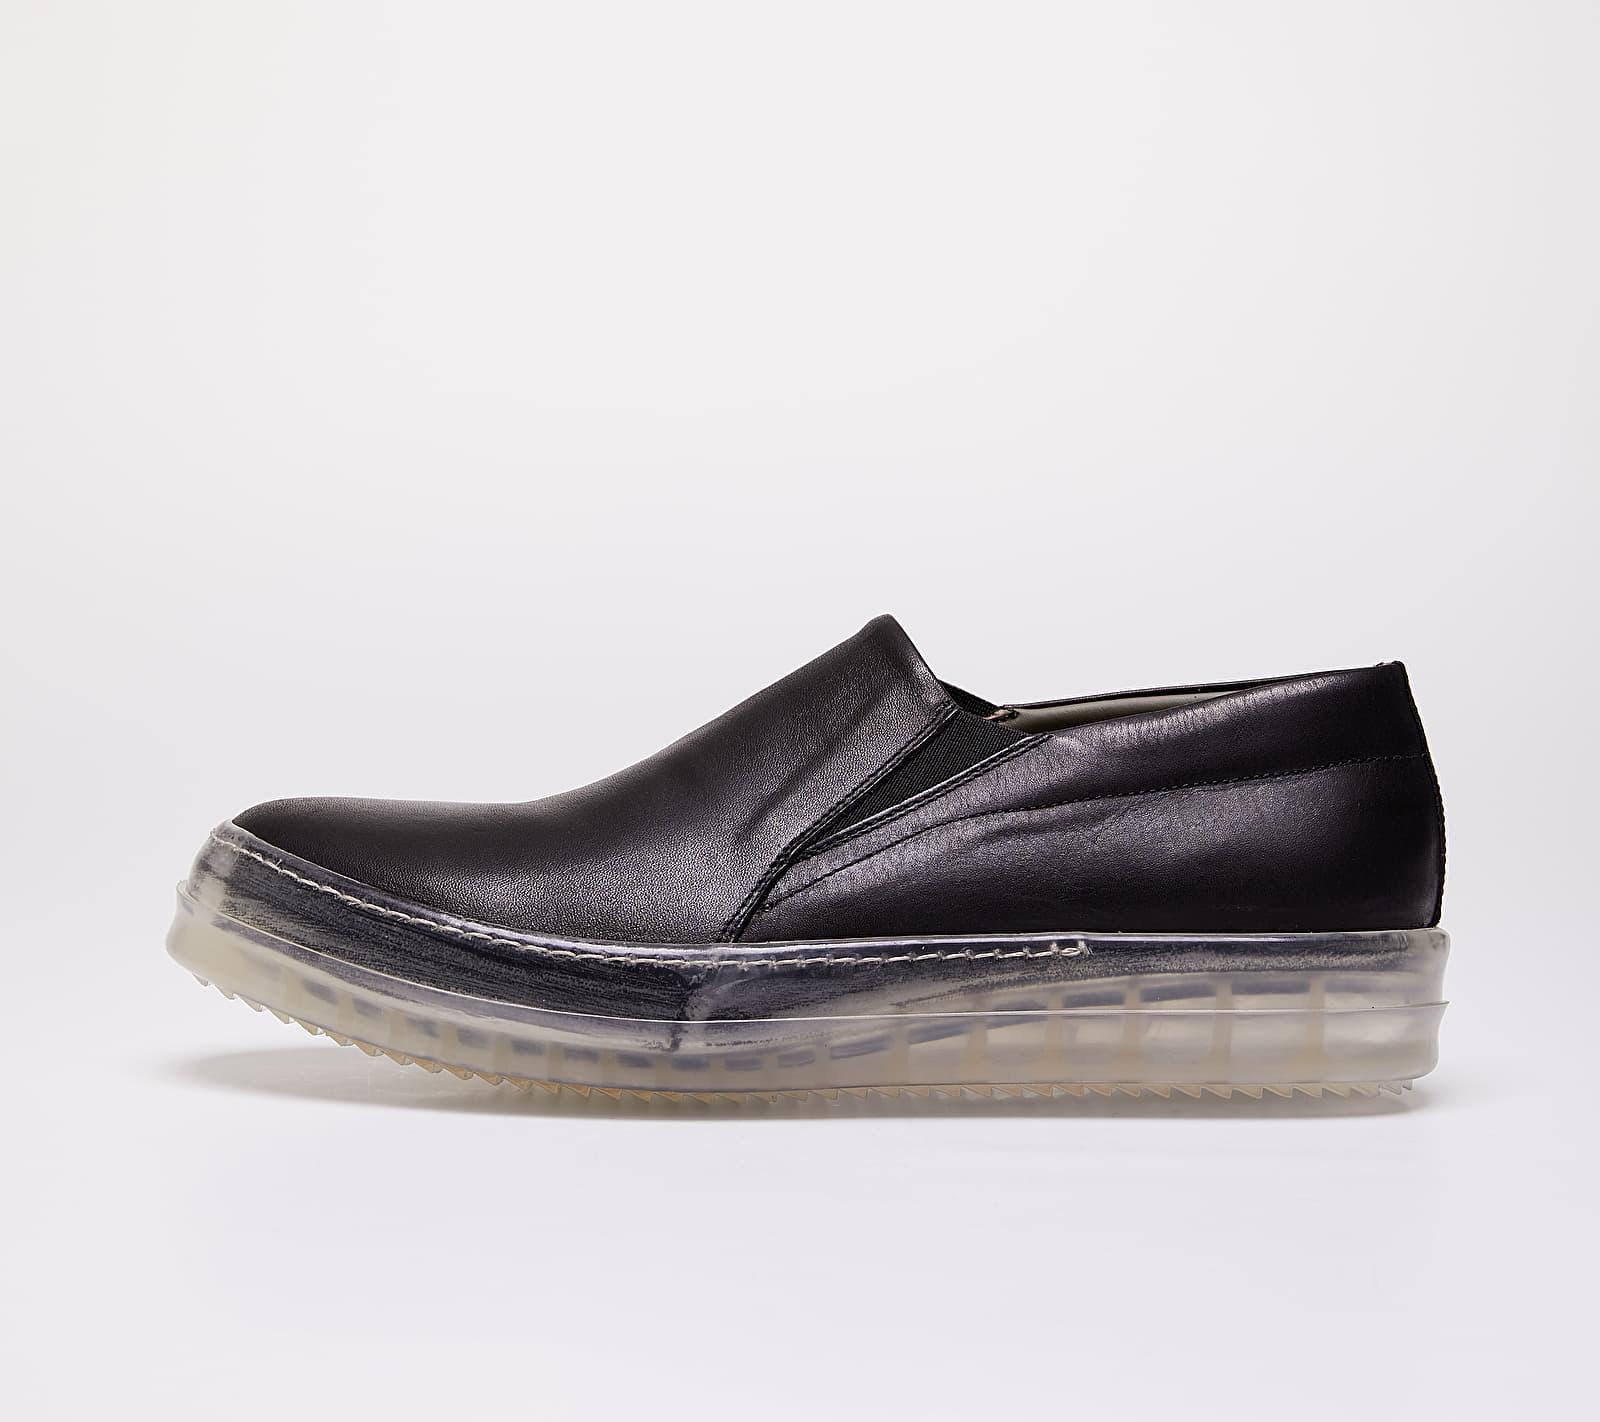 Rick Owens No Cap Boat Sneakers Black EUR 41